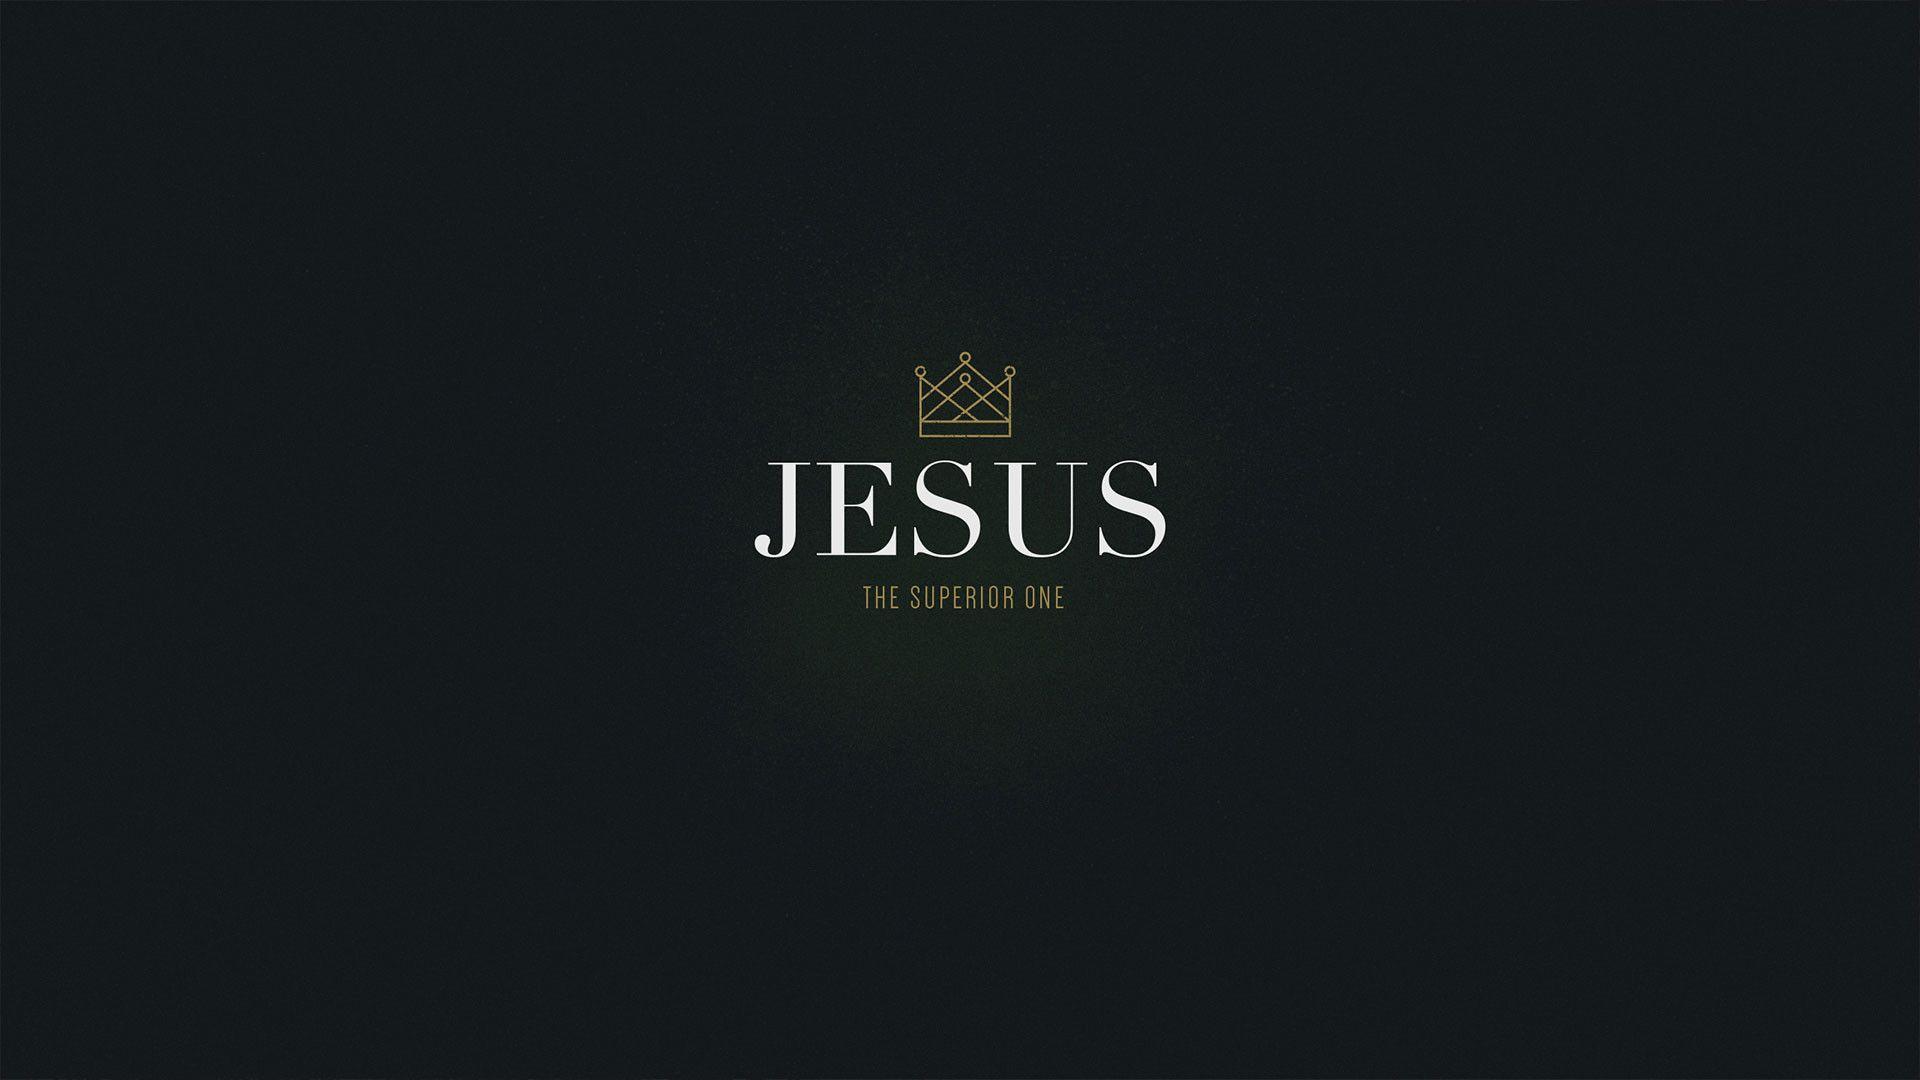 1920x1080 Jesus Wallpaper Jesus Jesus Images